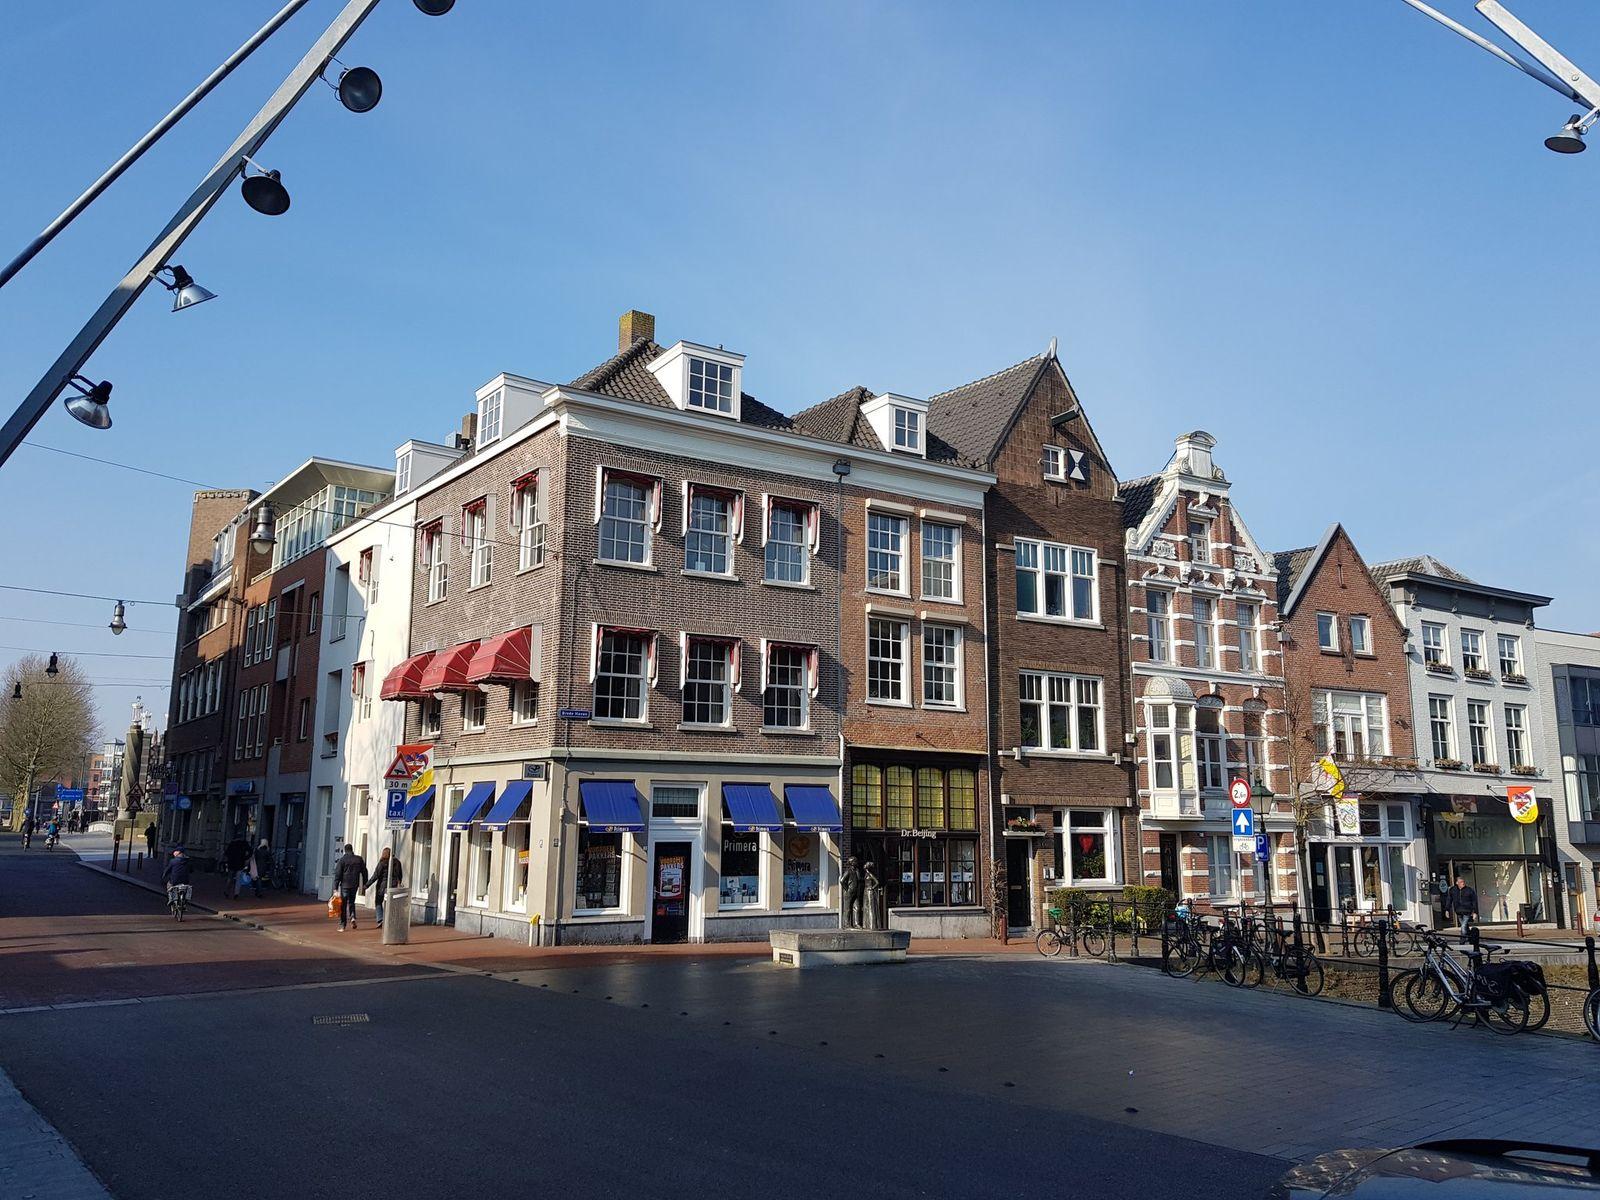 Visstraat 43, 's-hertogenbosch